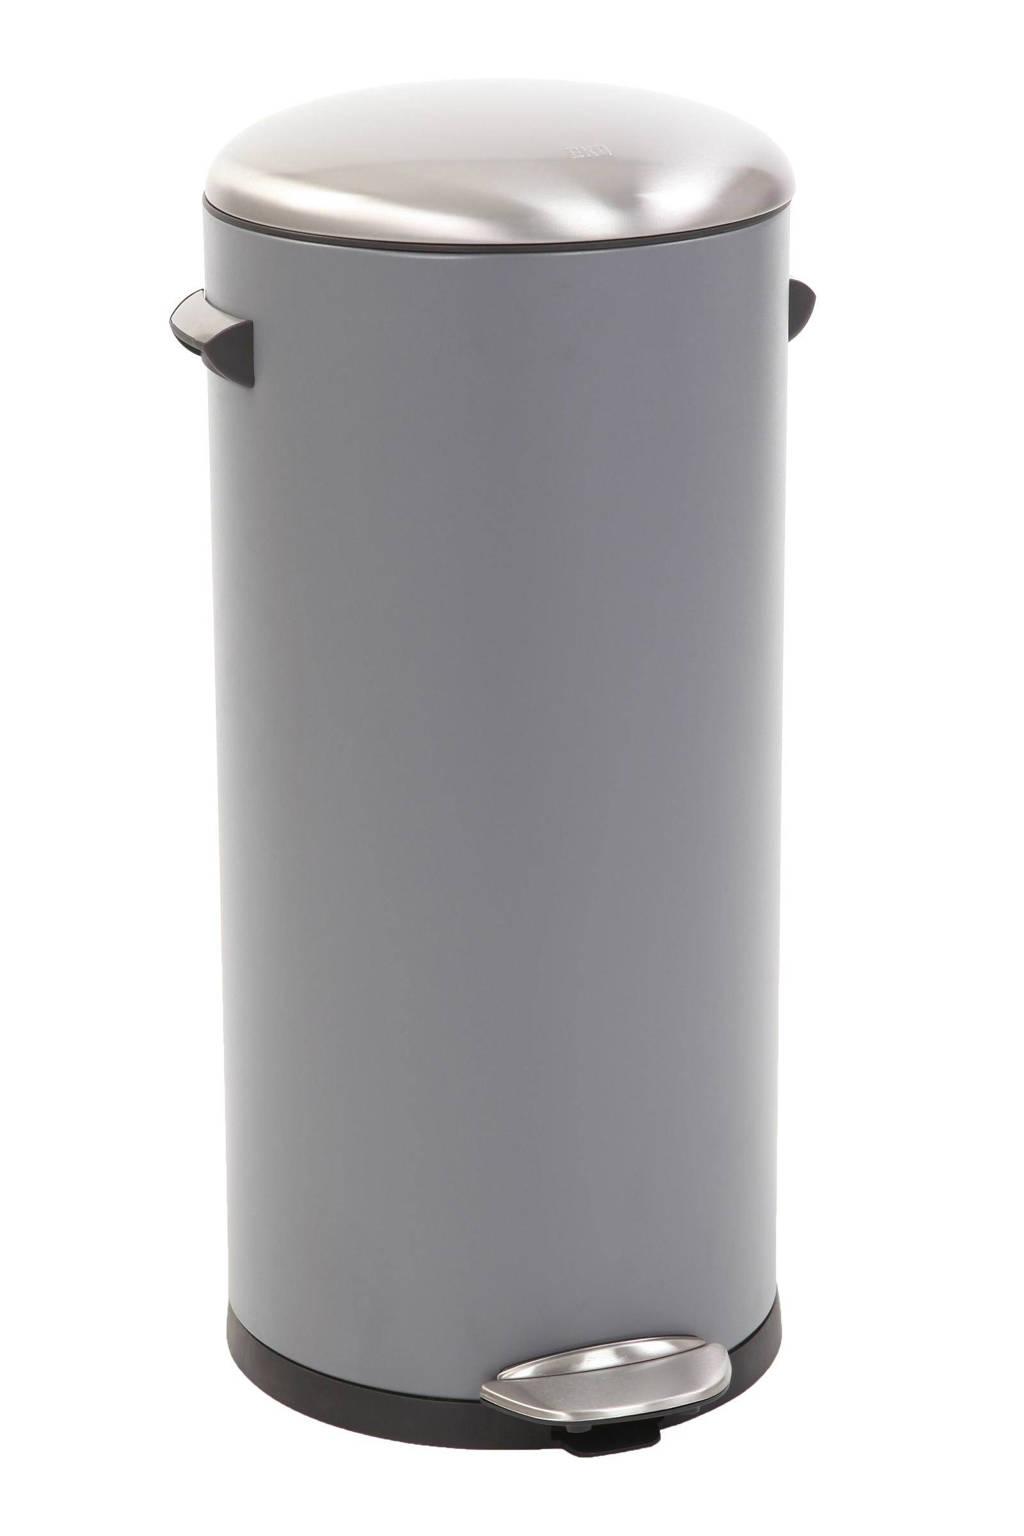 EKO Belle Deluxe Step Bin, 30 liter pedaalemmer, Sandcoated grijs